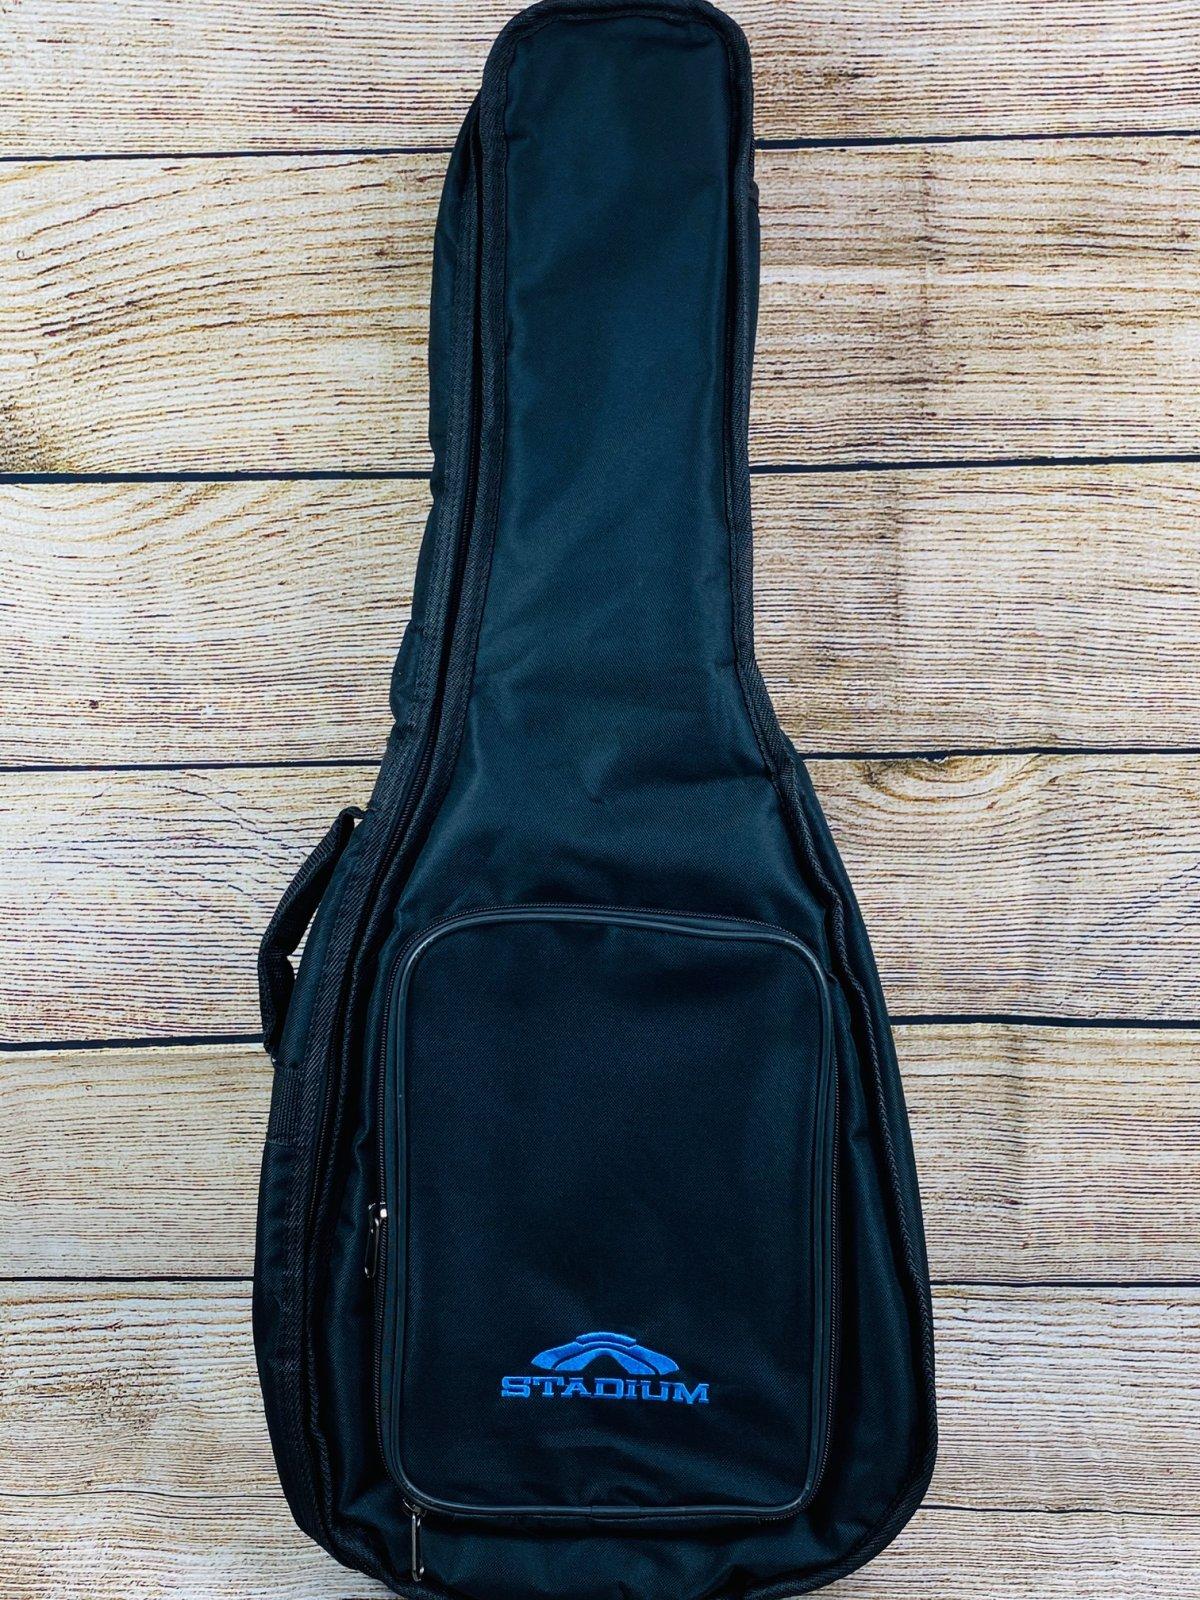 Stadium Classical Guitar Gig Bag- 1/2 Size